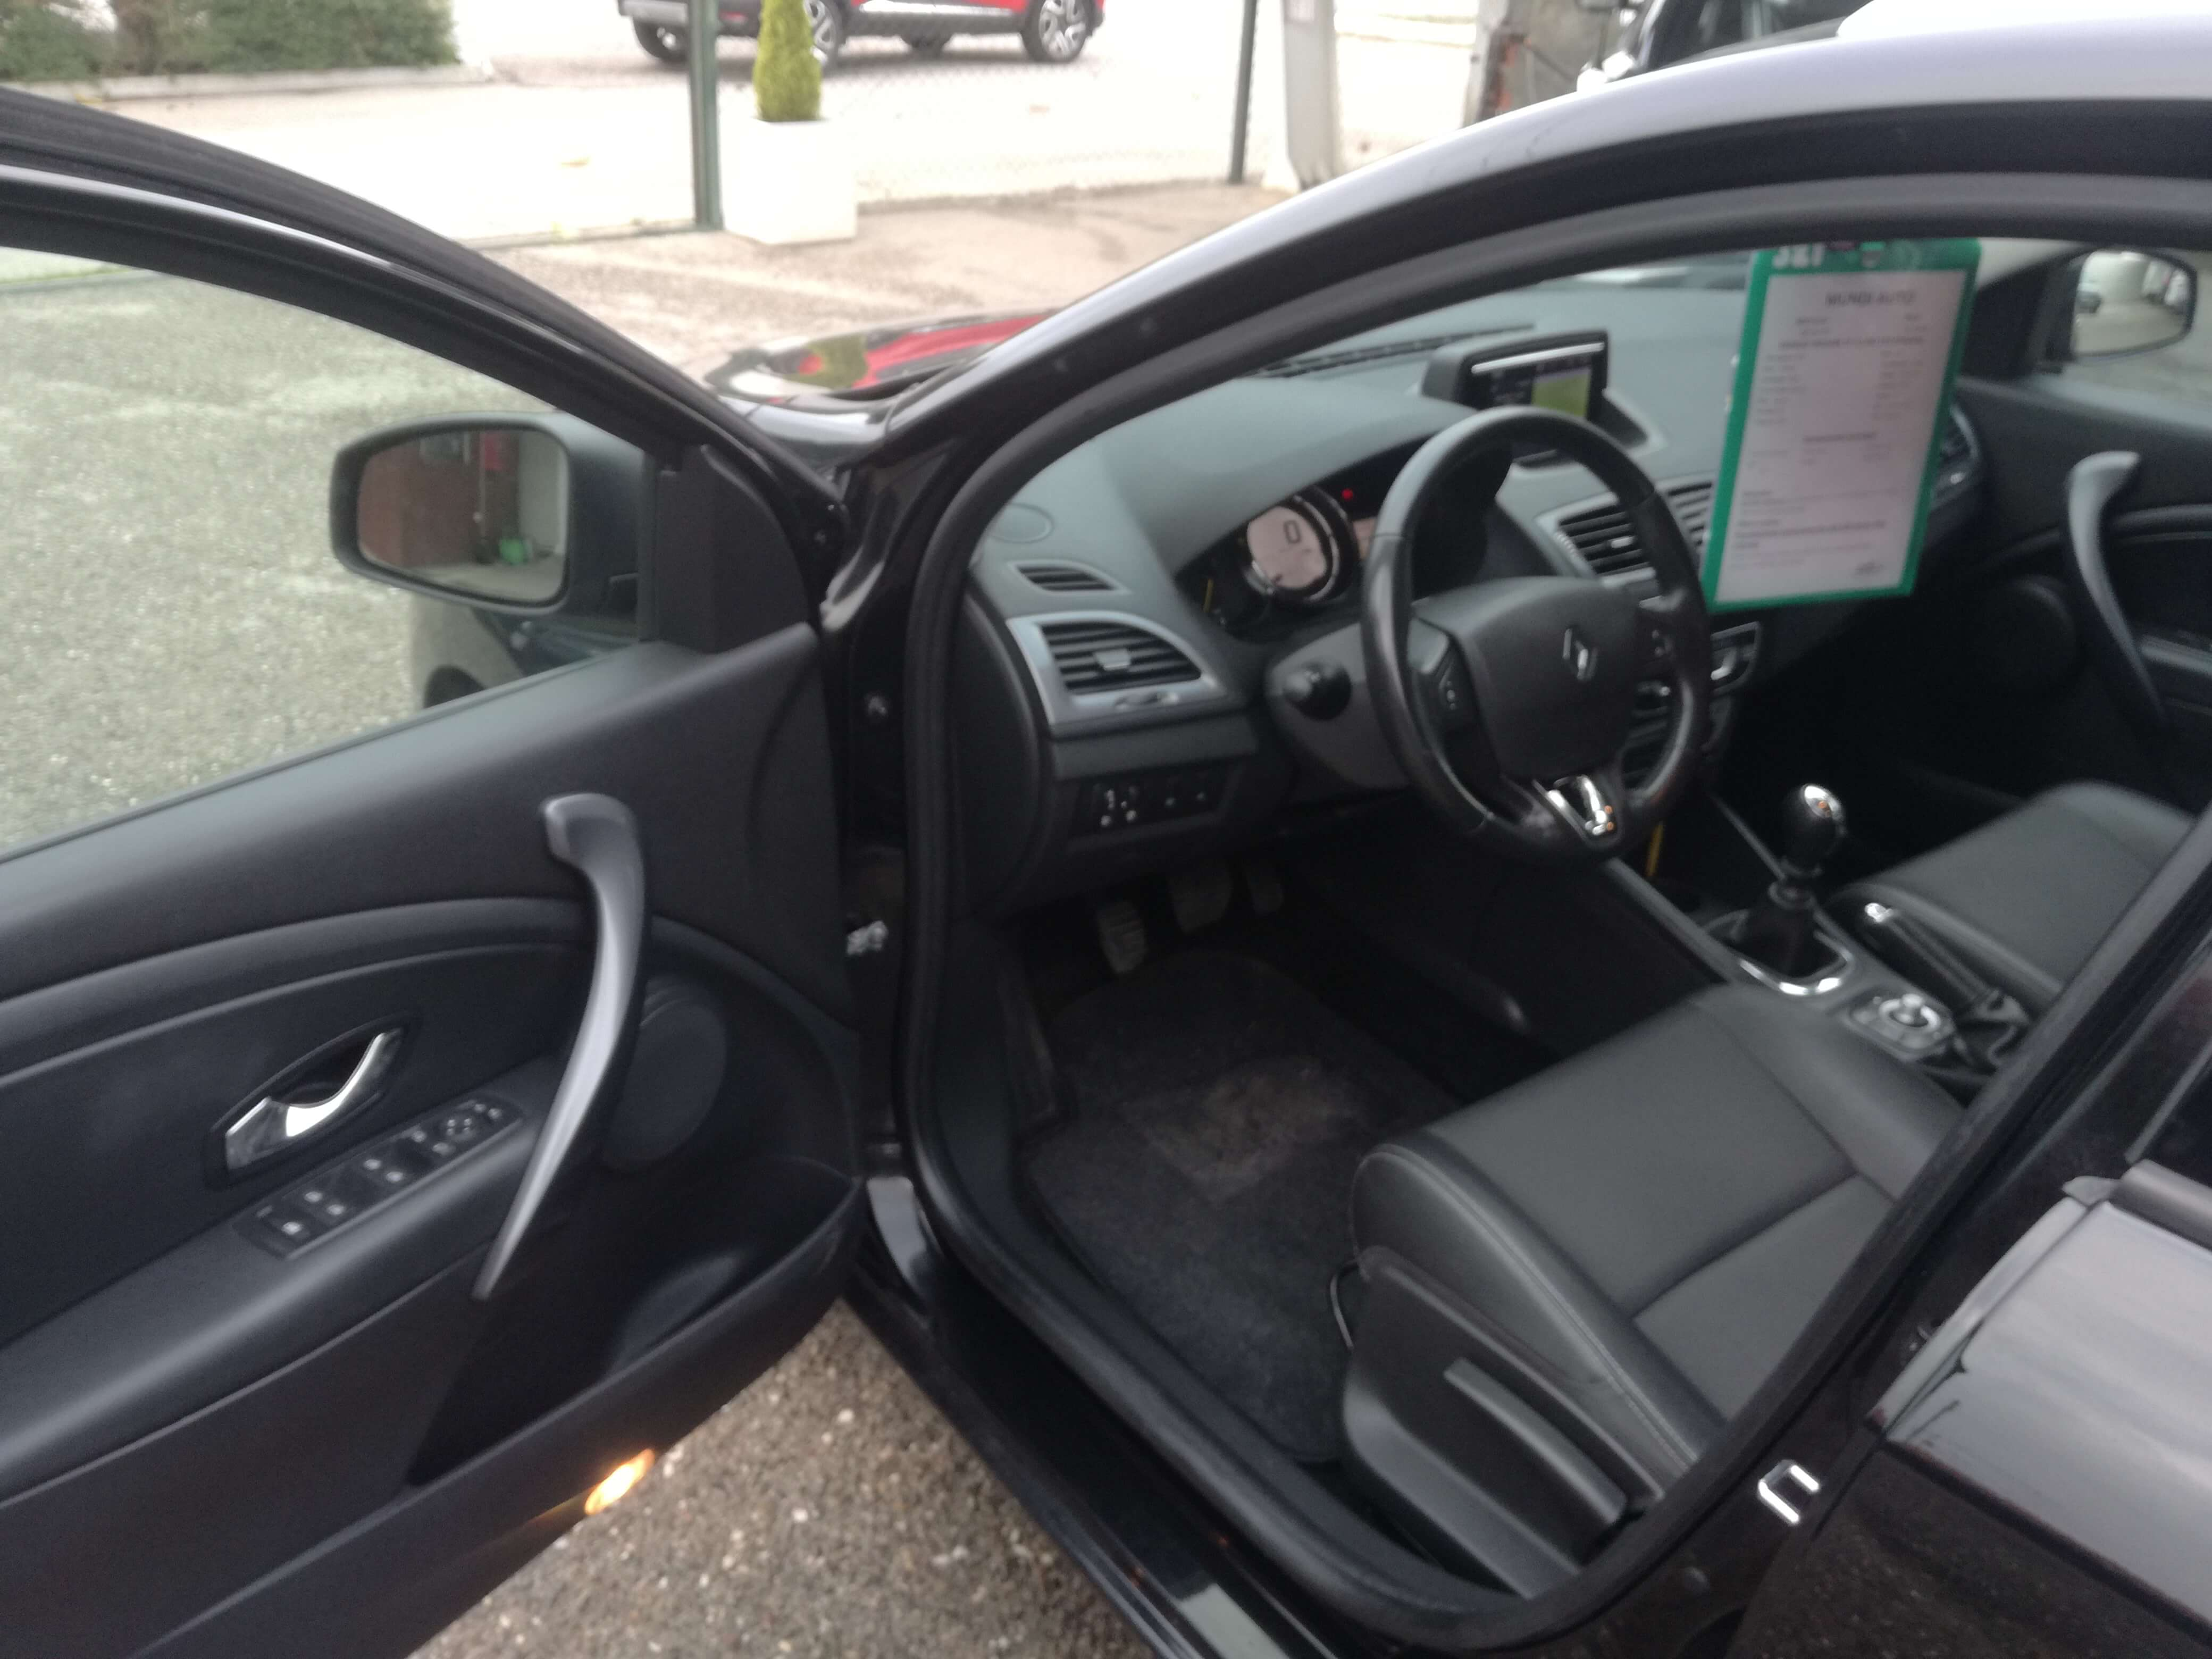 Renault Mégane SPORTS TOURER 1.5 DCI 110cv | Imagem 10